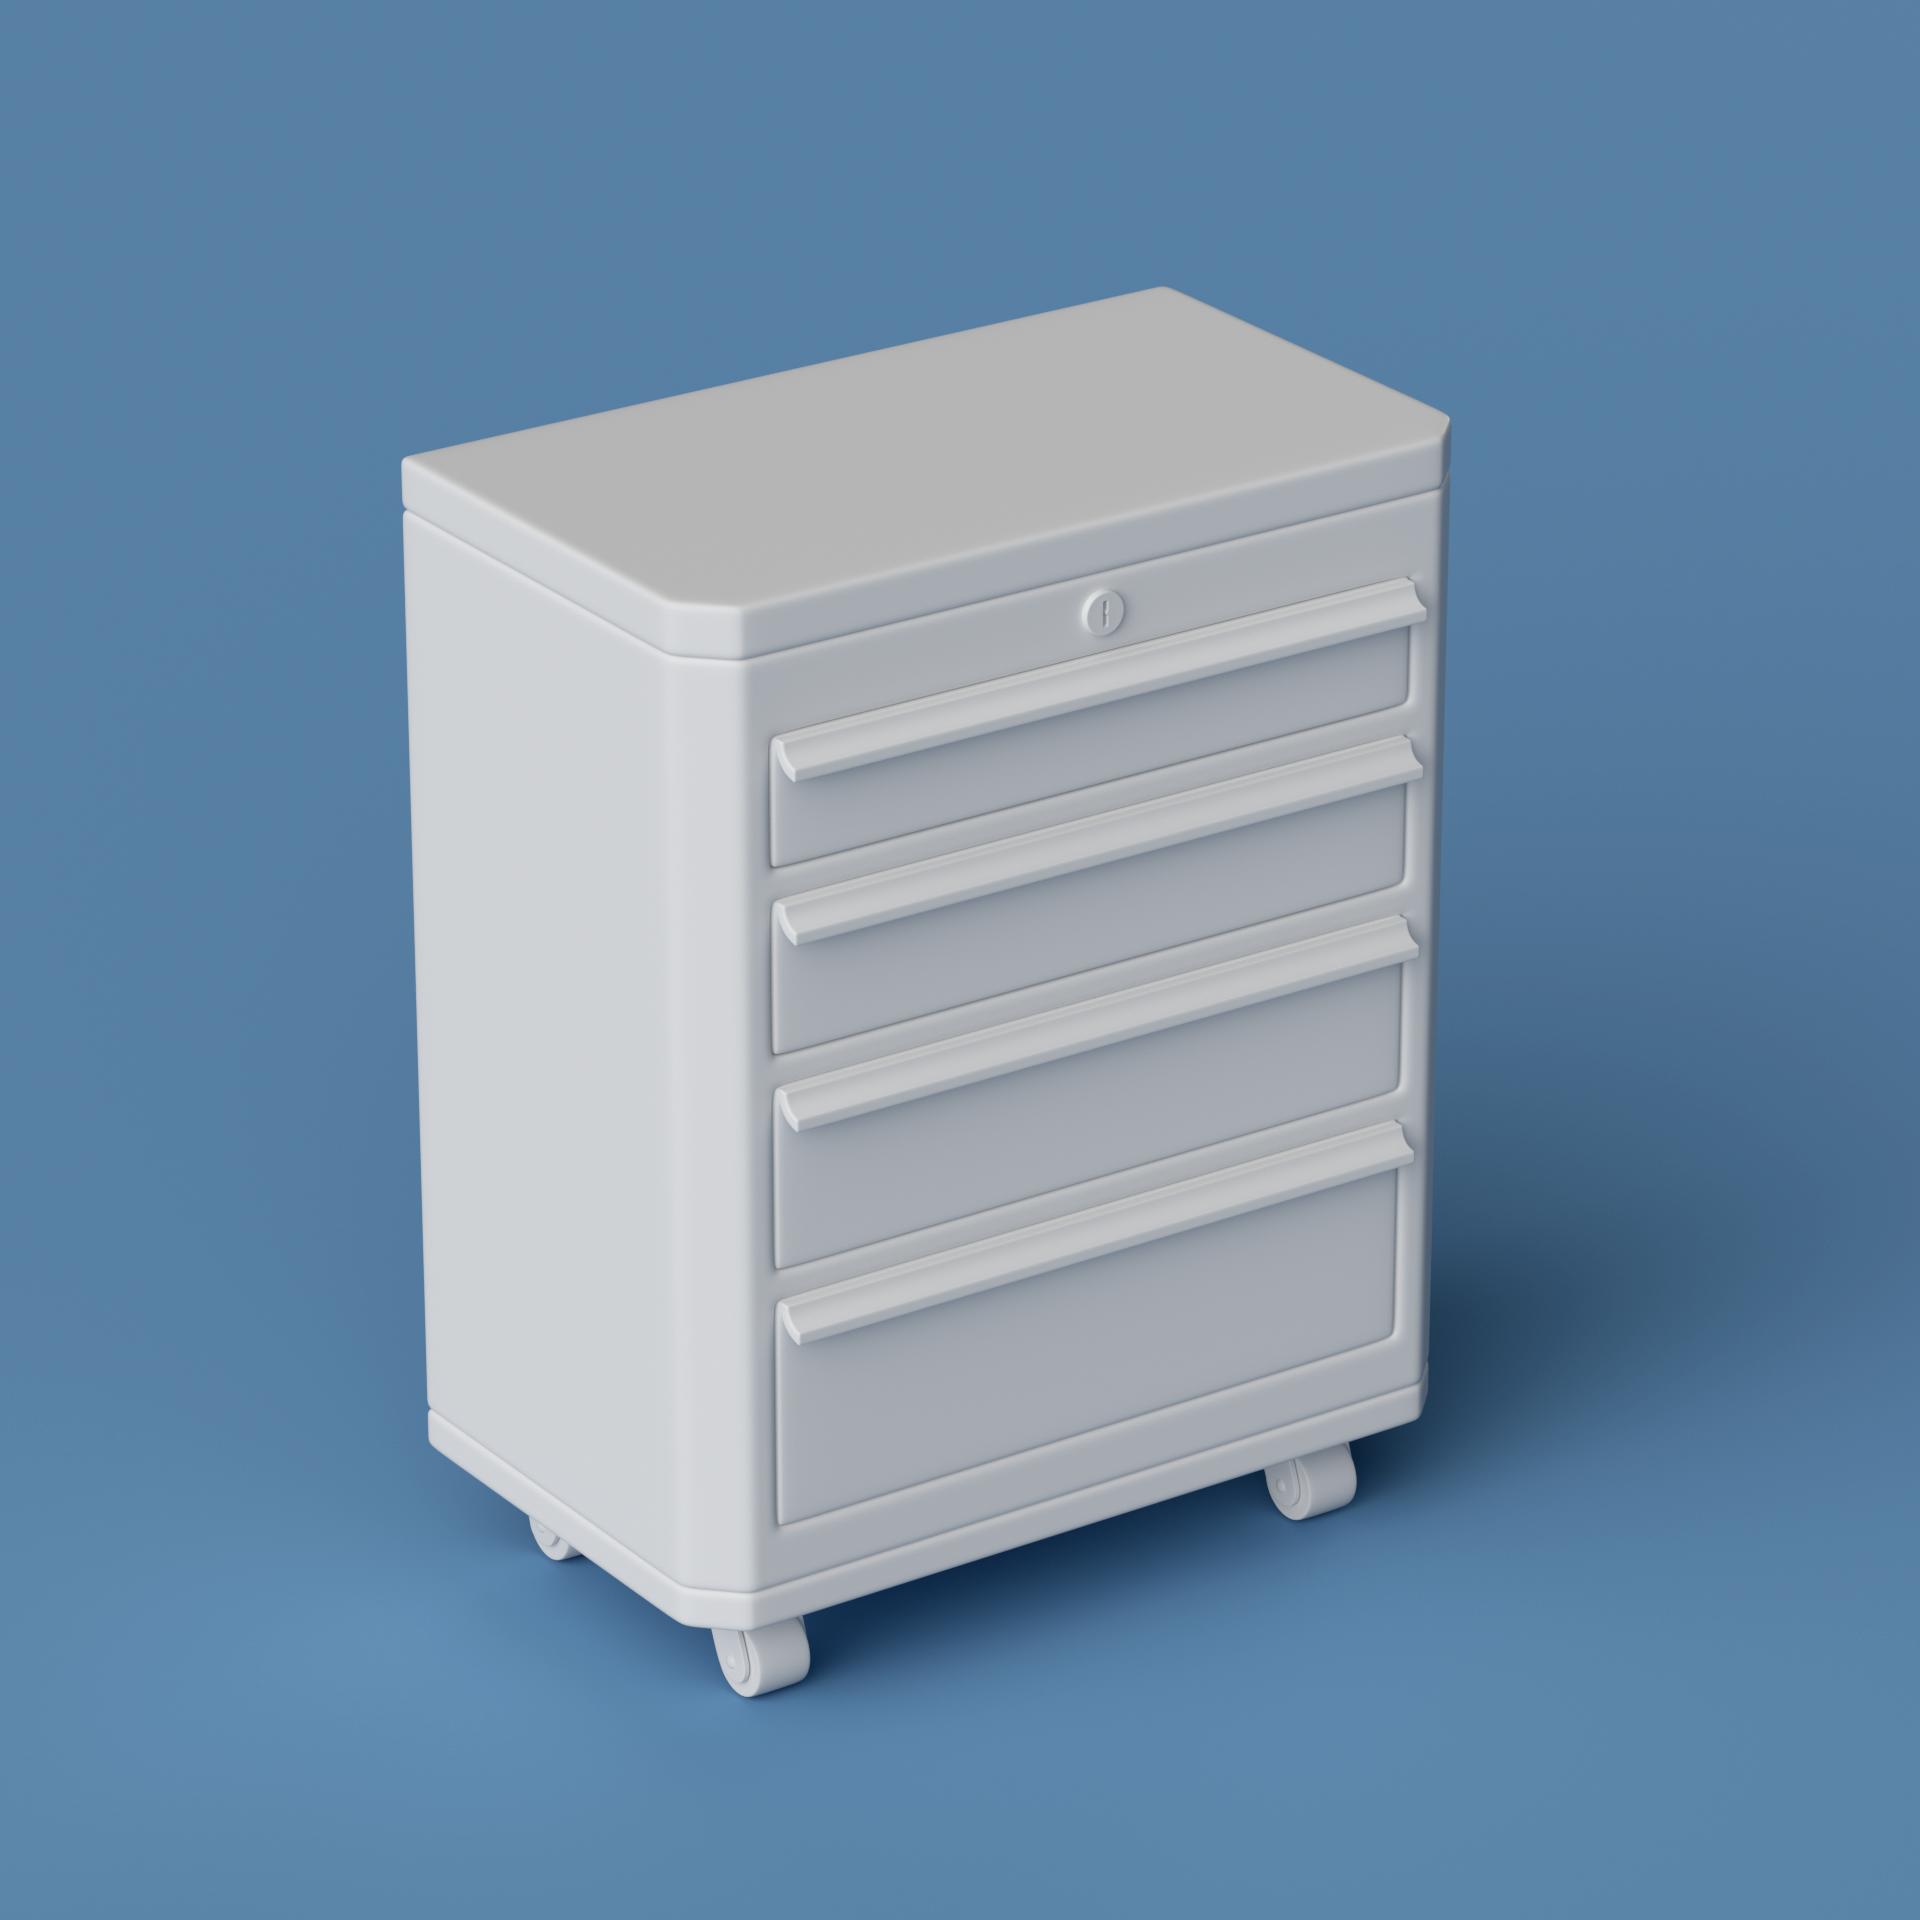 shop_drawer.png